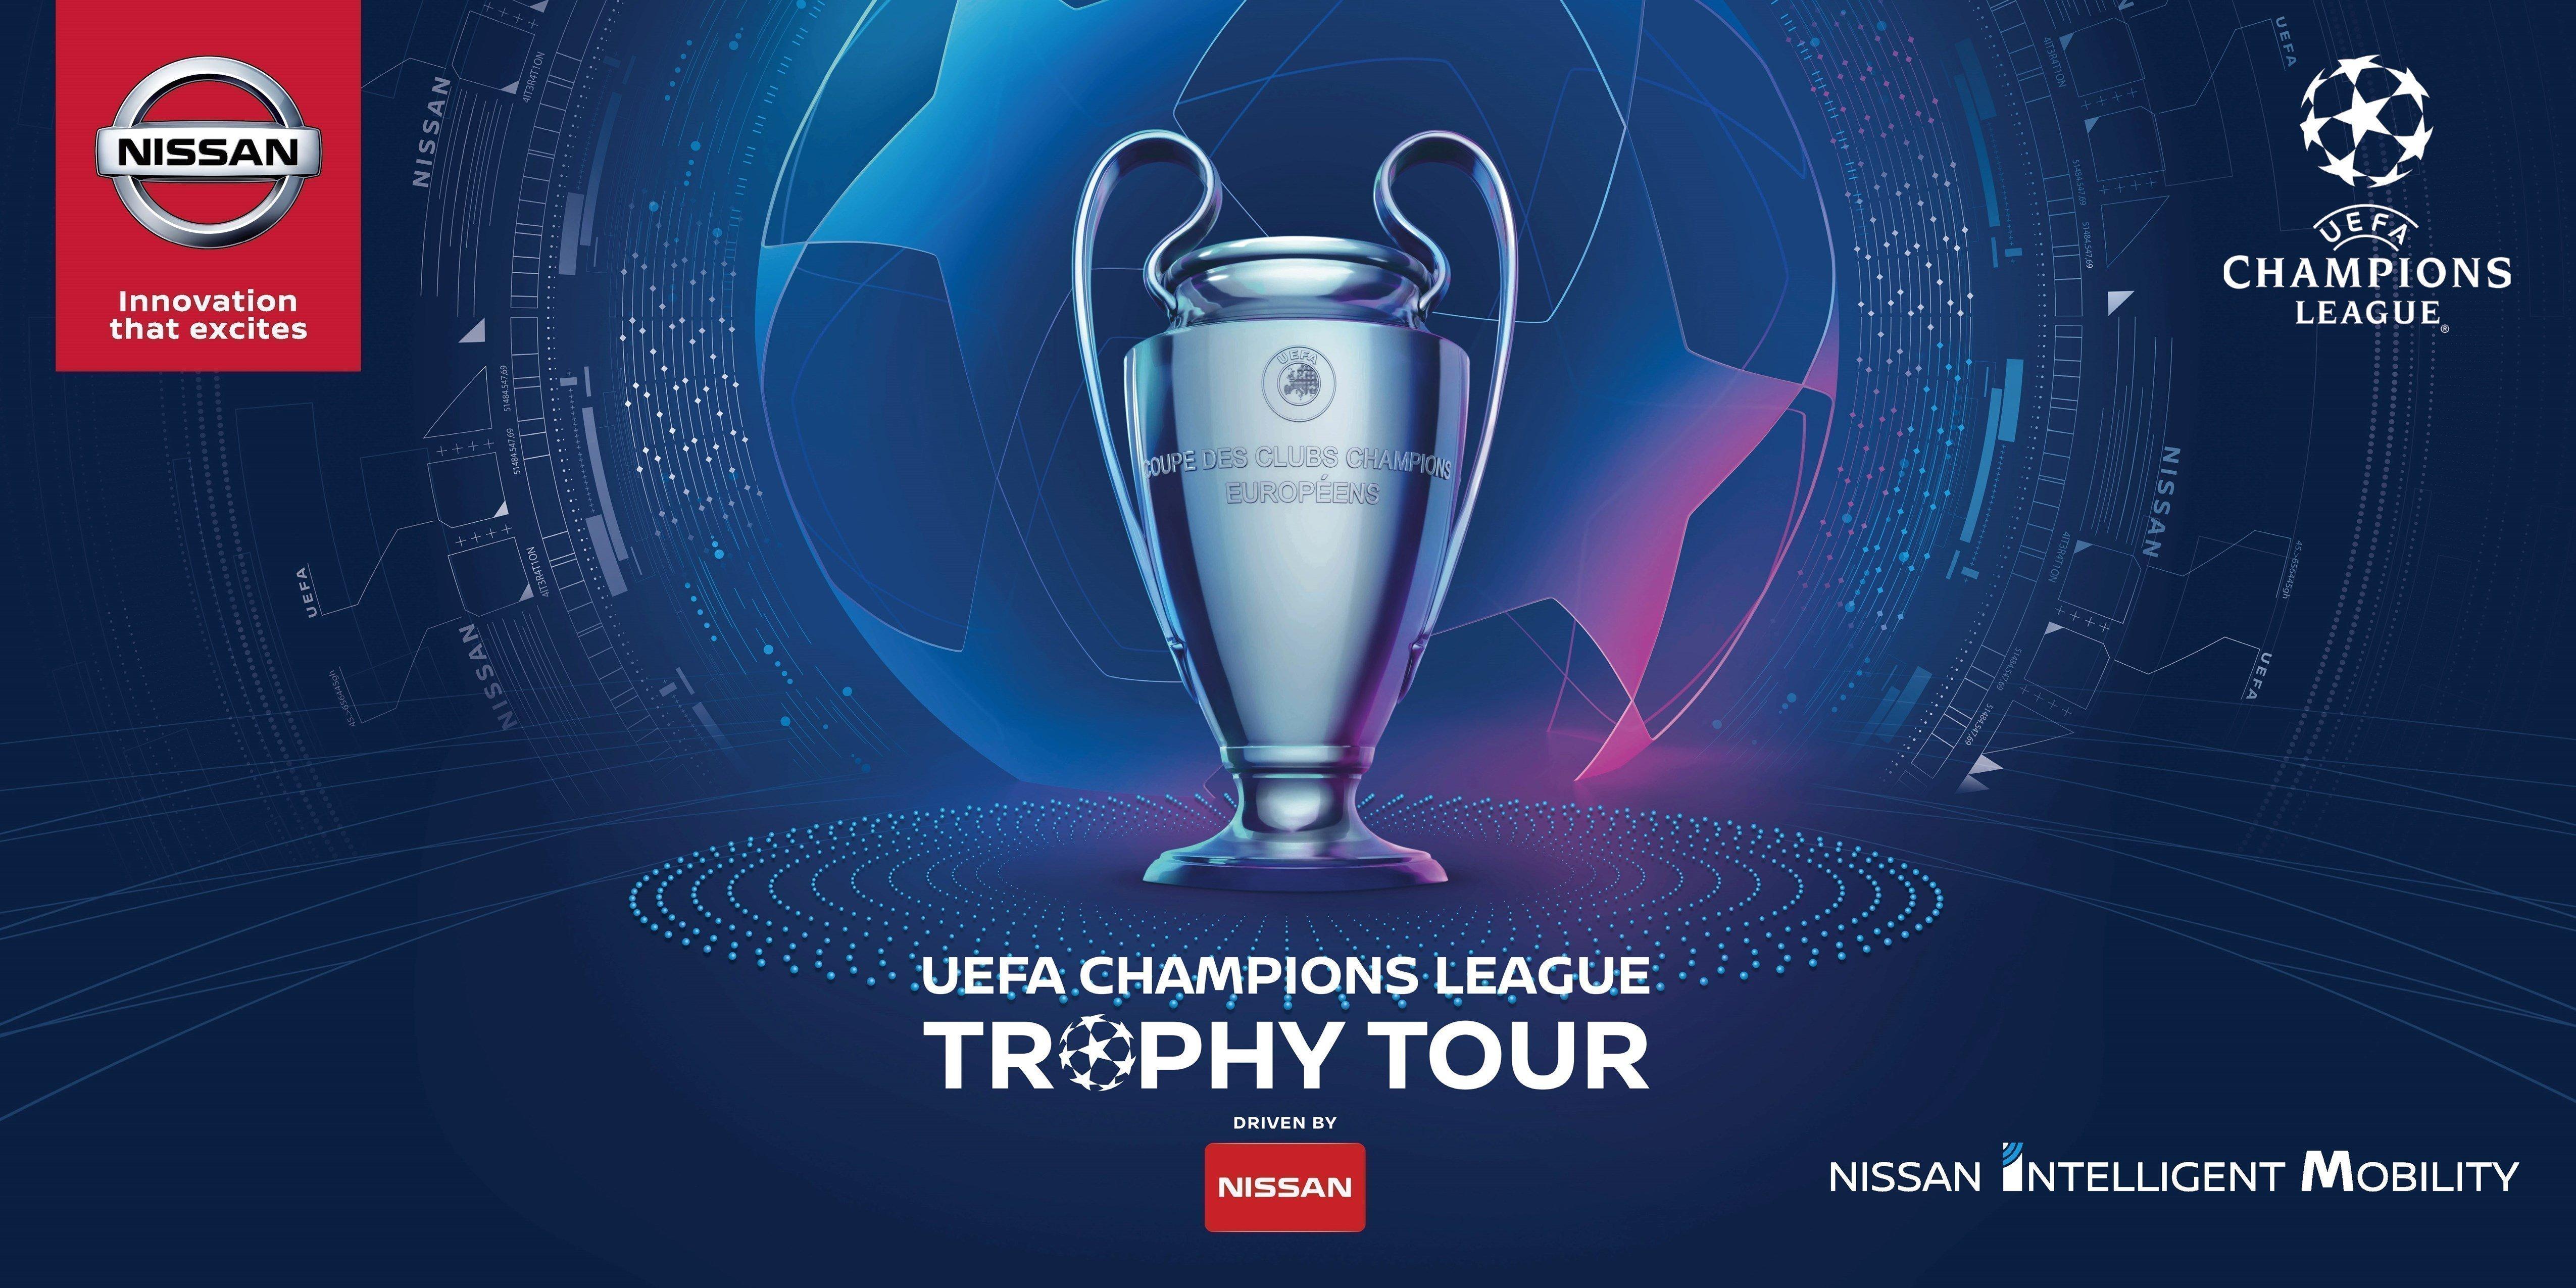 Champions League Gallery: Η Nissan βγάζει… περιοδεία το κύπελλο του UEFA Champions